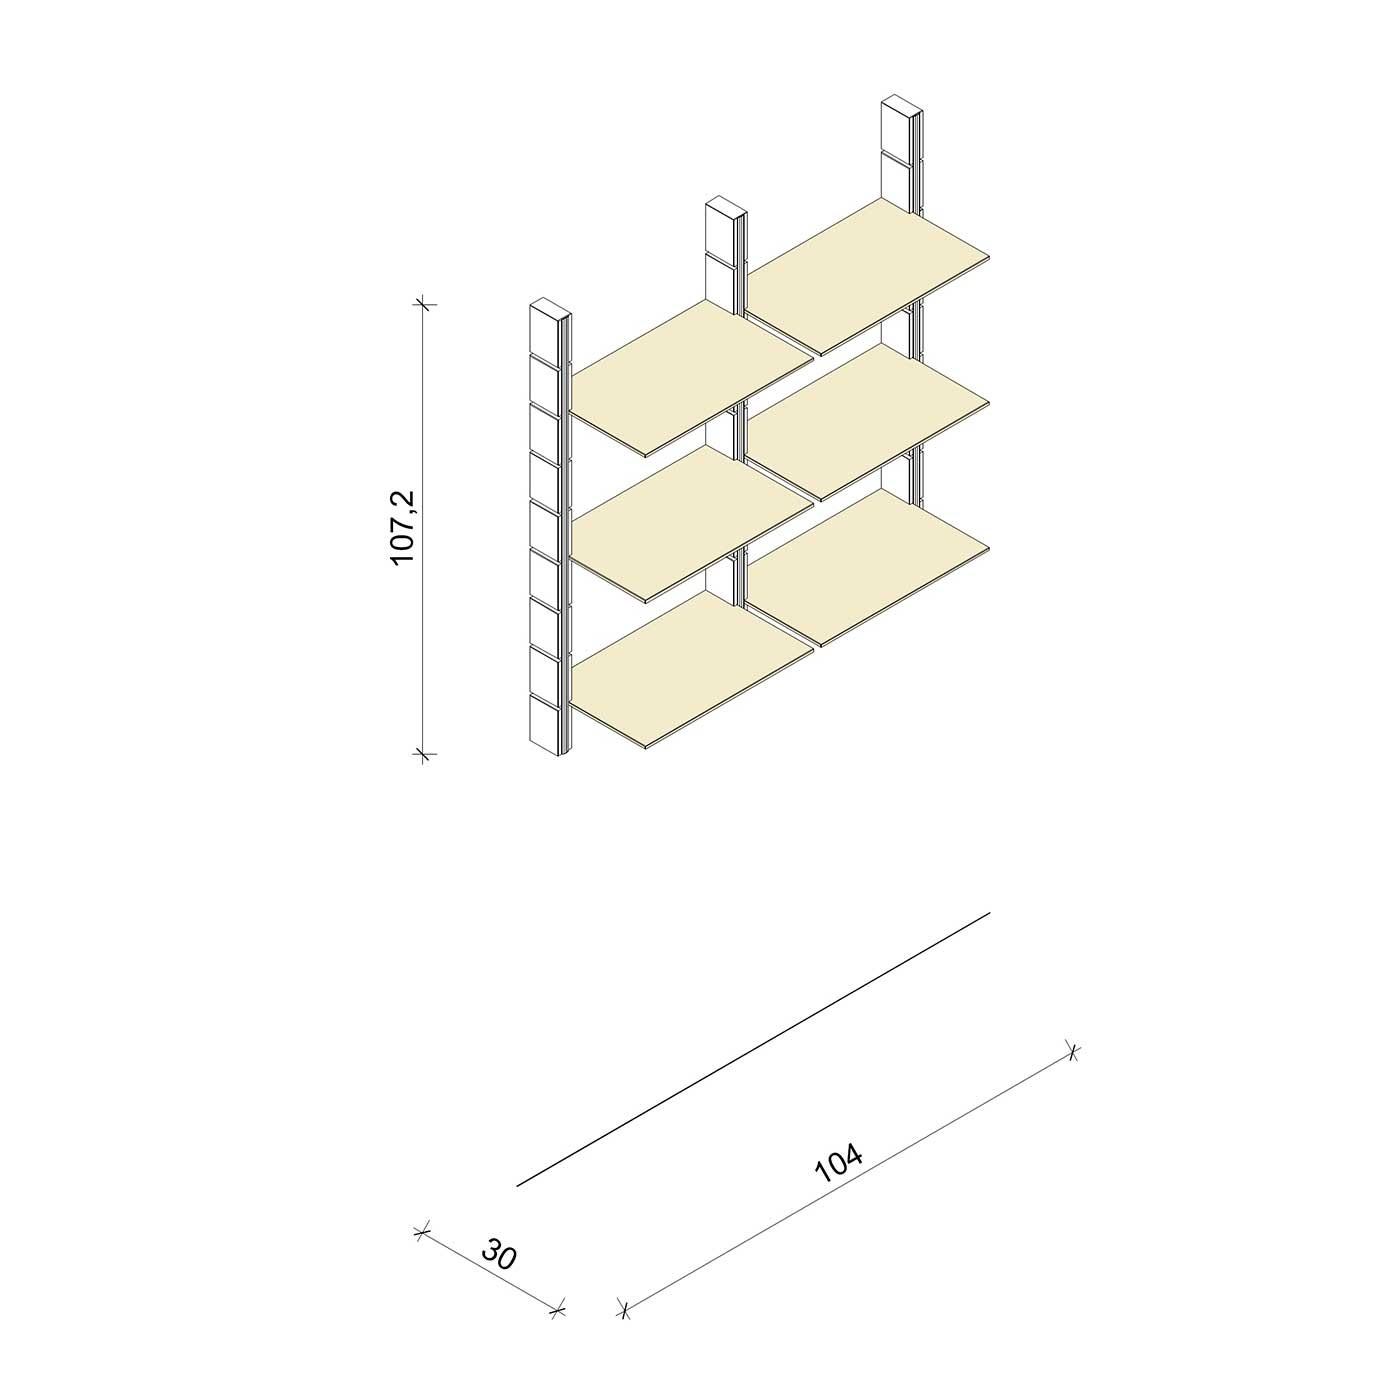 Bücherregal - Comfort (M) 104 - Maß: 104 x 107,2 x 30 cm (B x H x T)